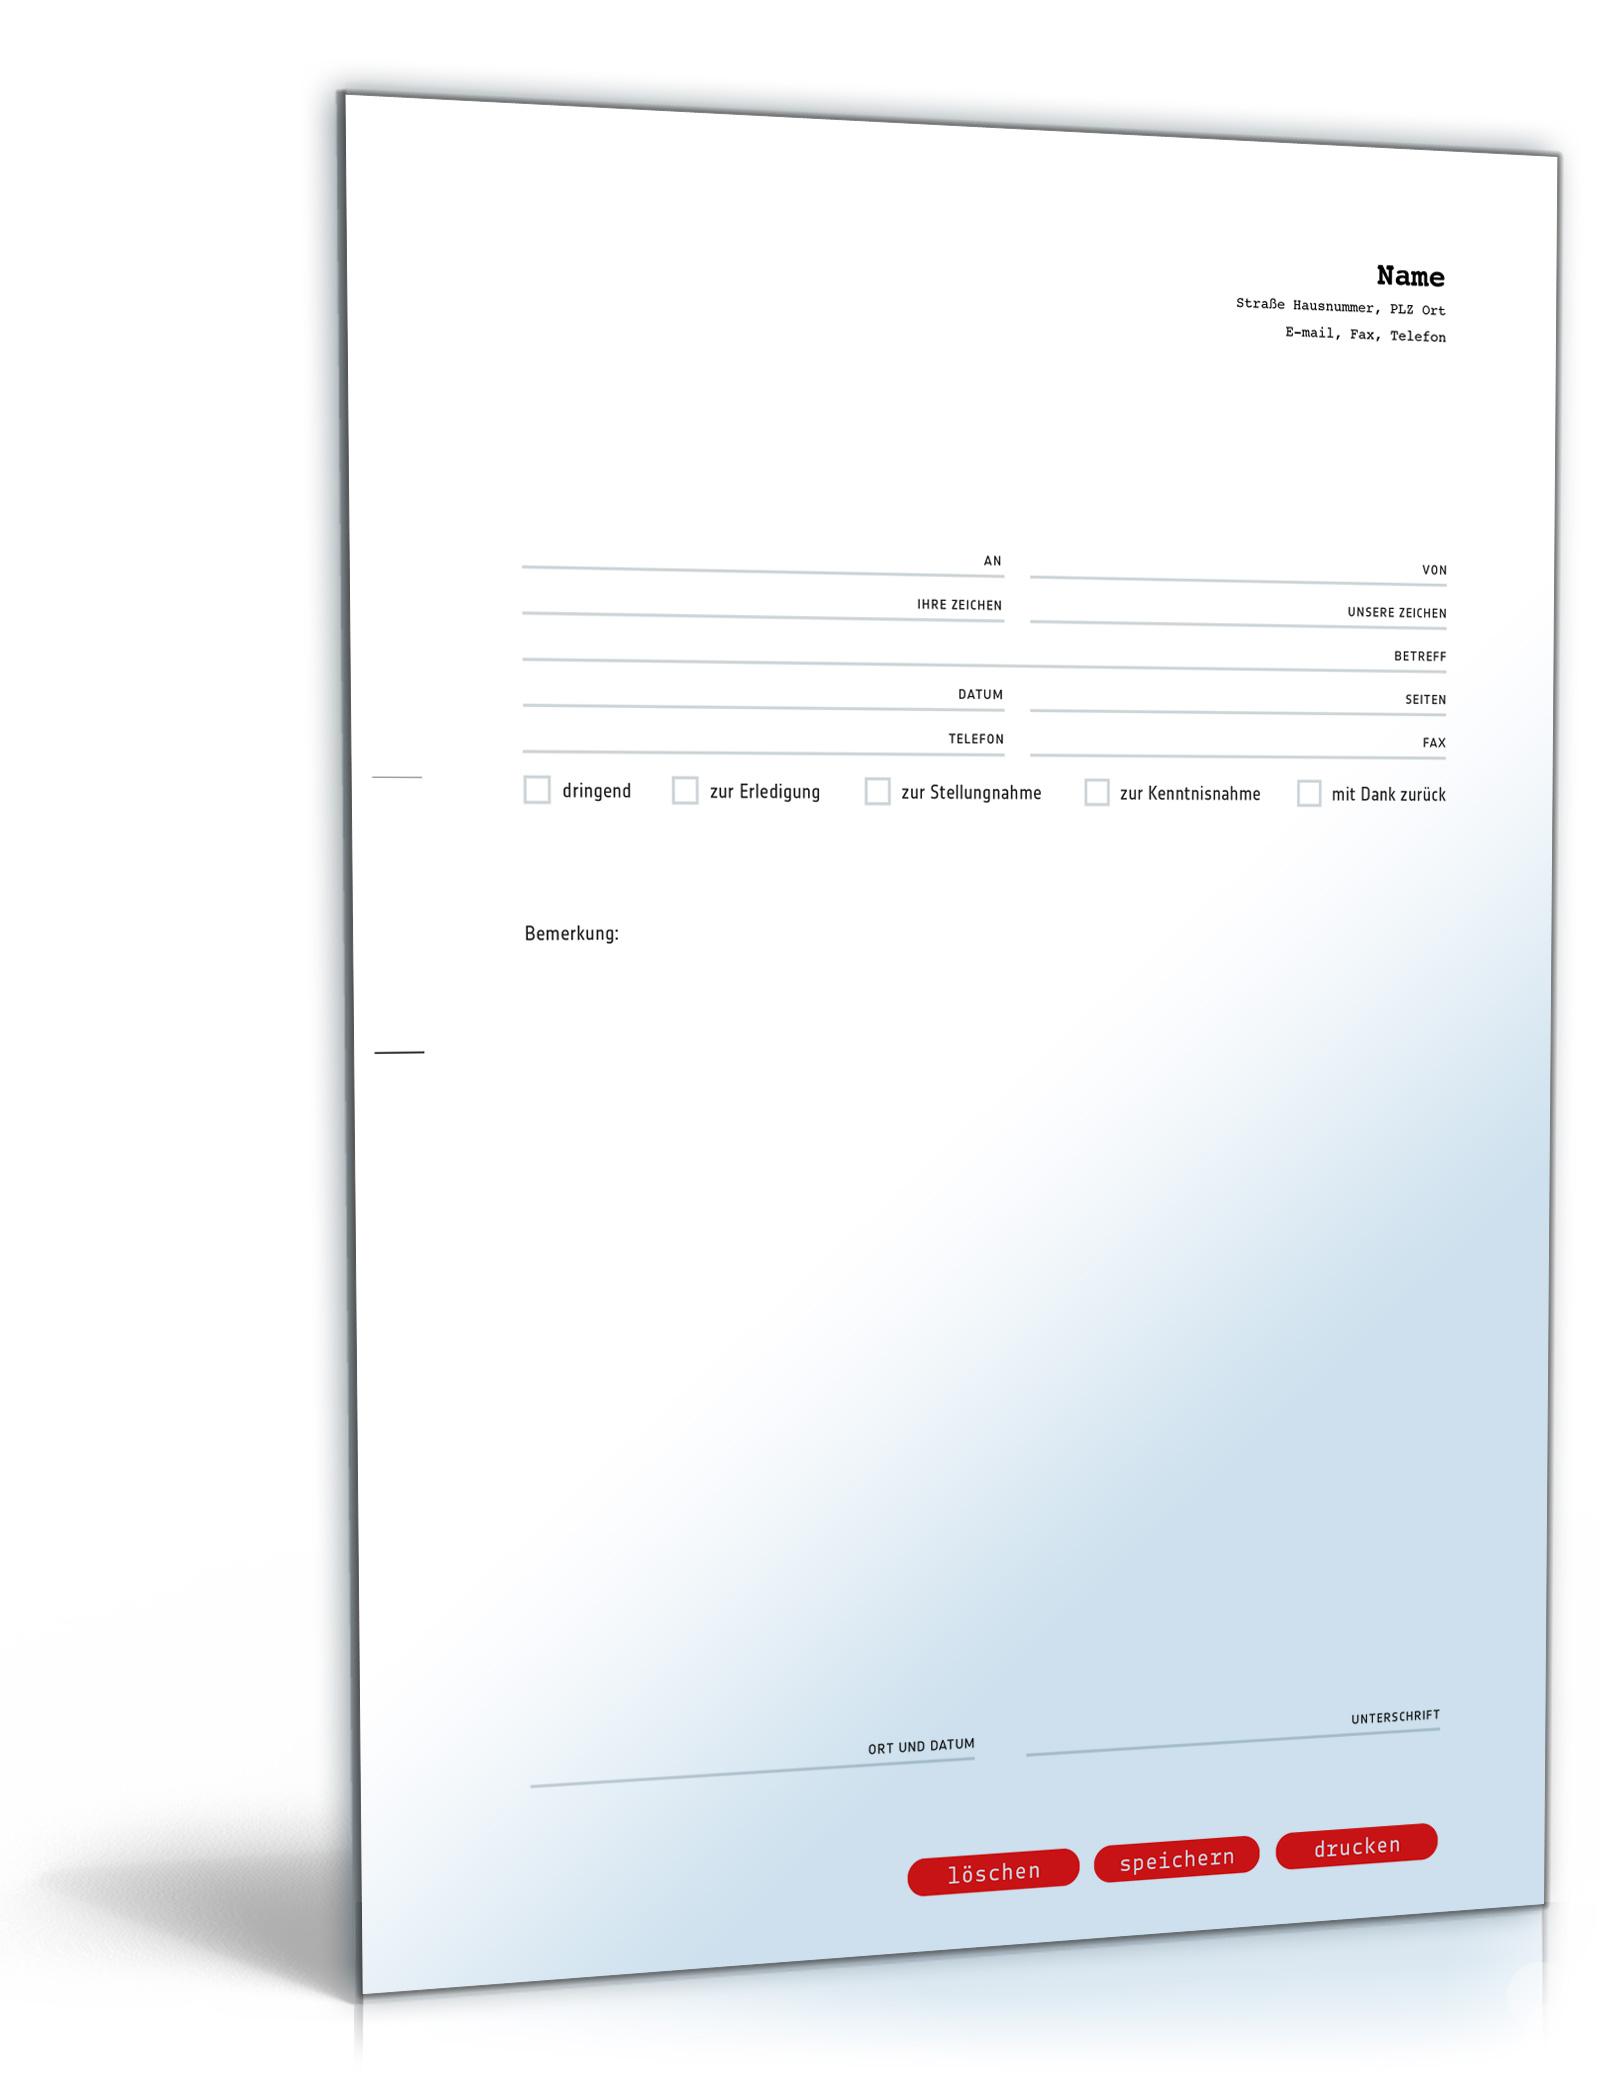 Faxvorlage (professionell)